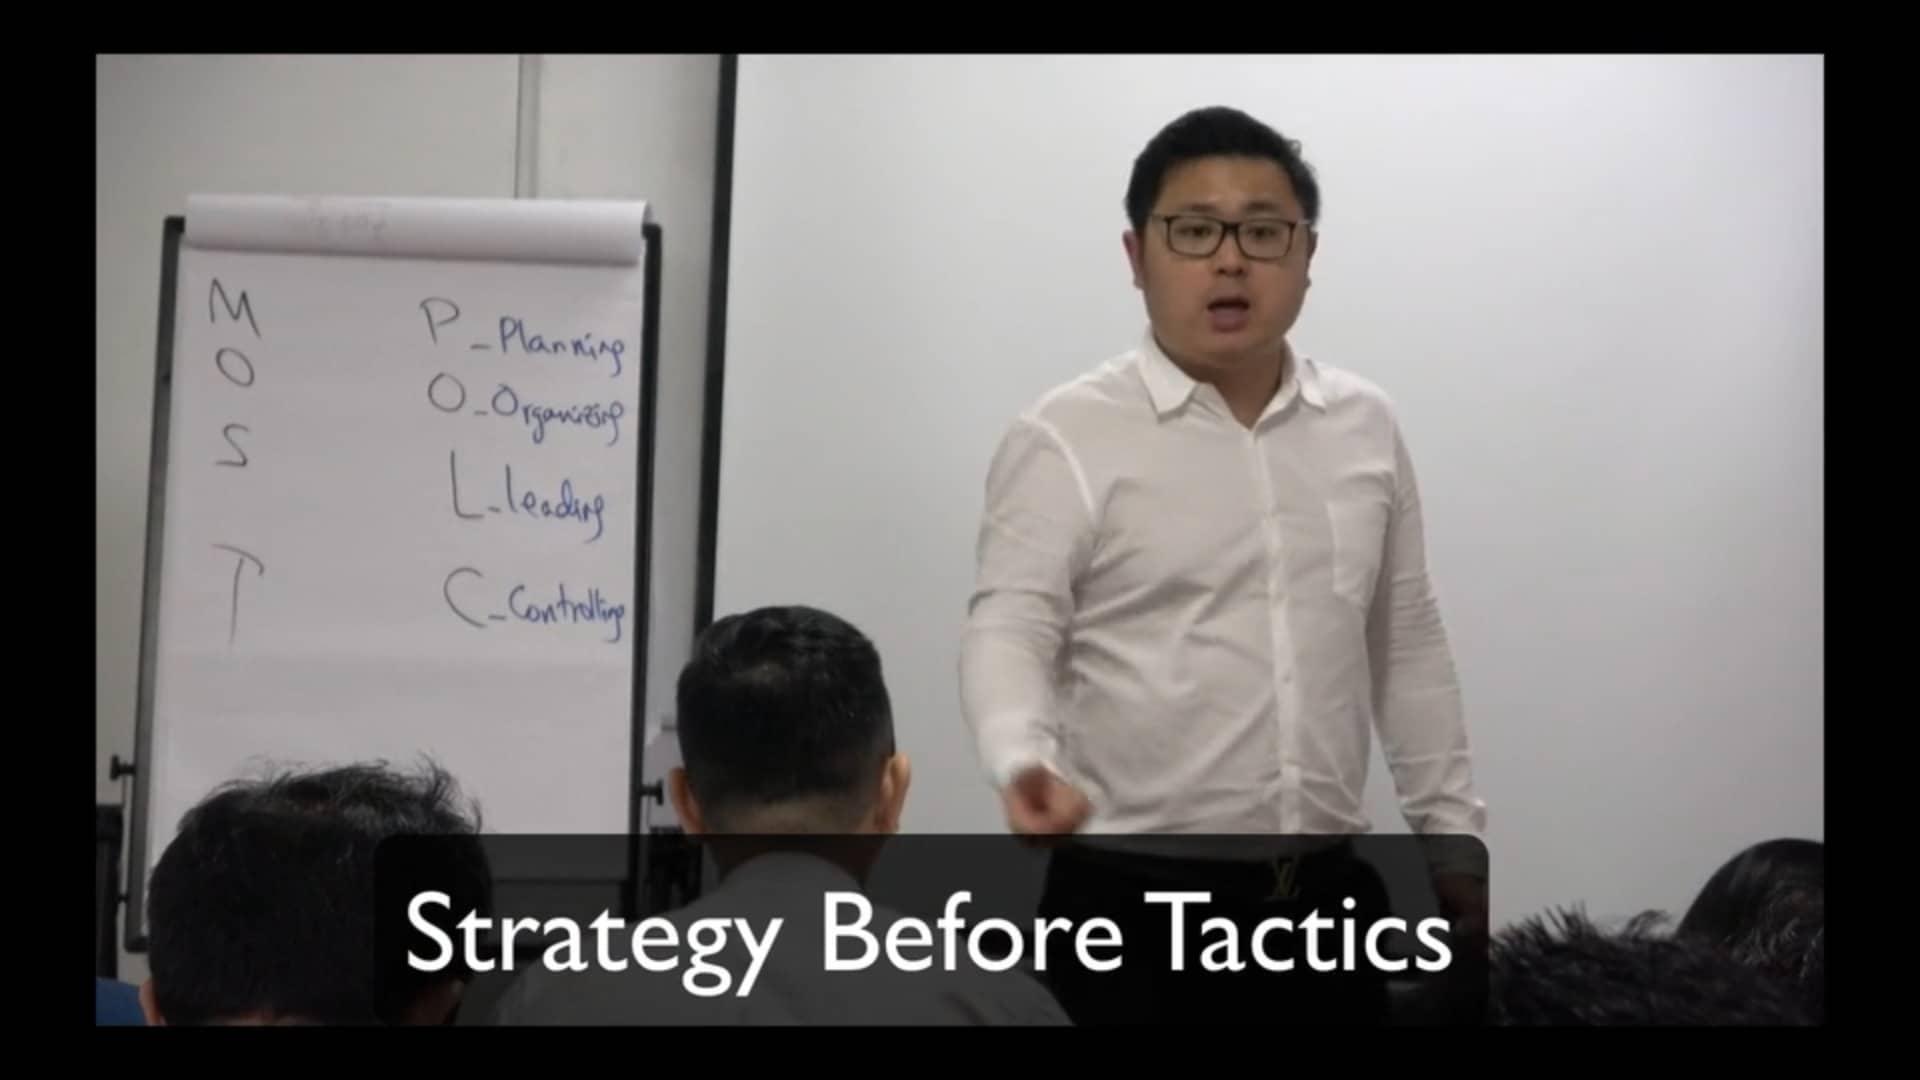 12. Strategy Before Tactics